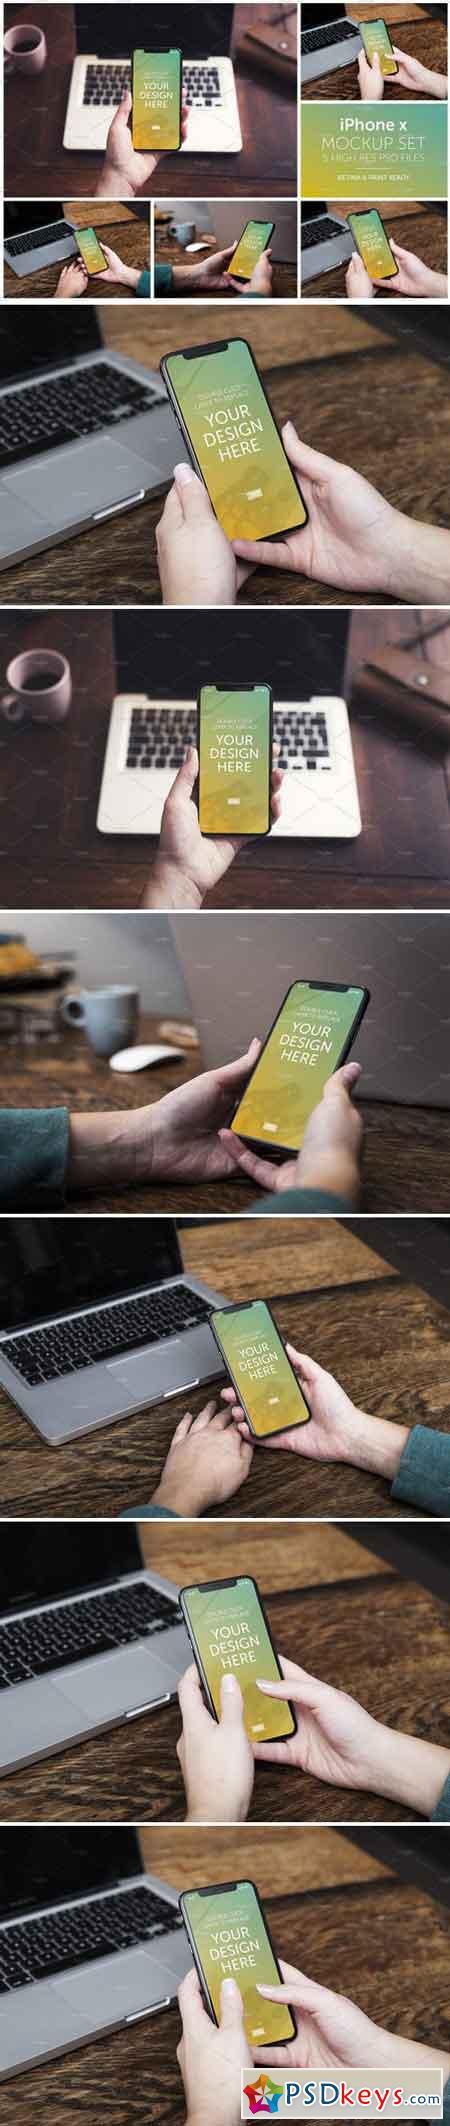 iPhone x mockup 2231880